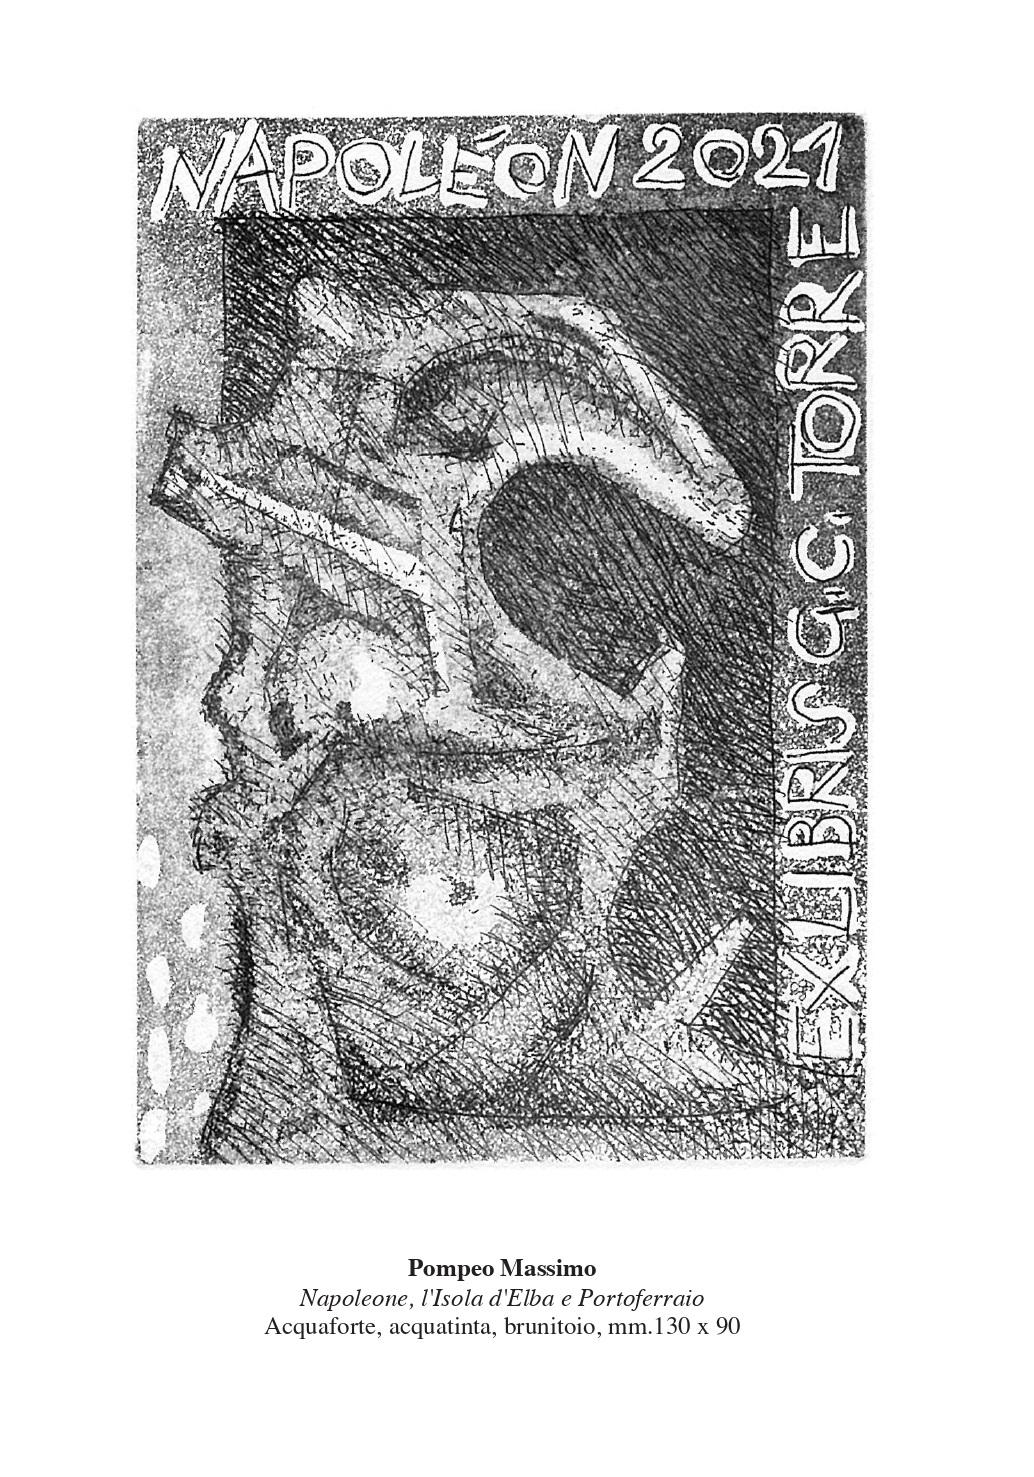 CATALOGO exlibris 2021-123_page-0001